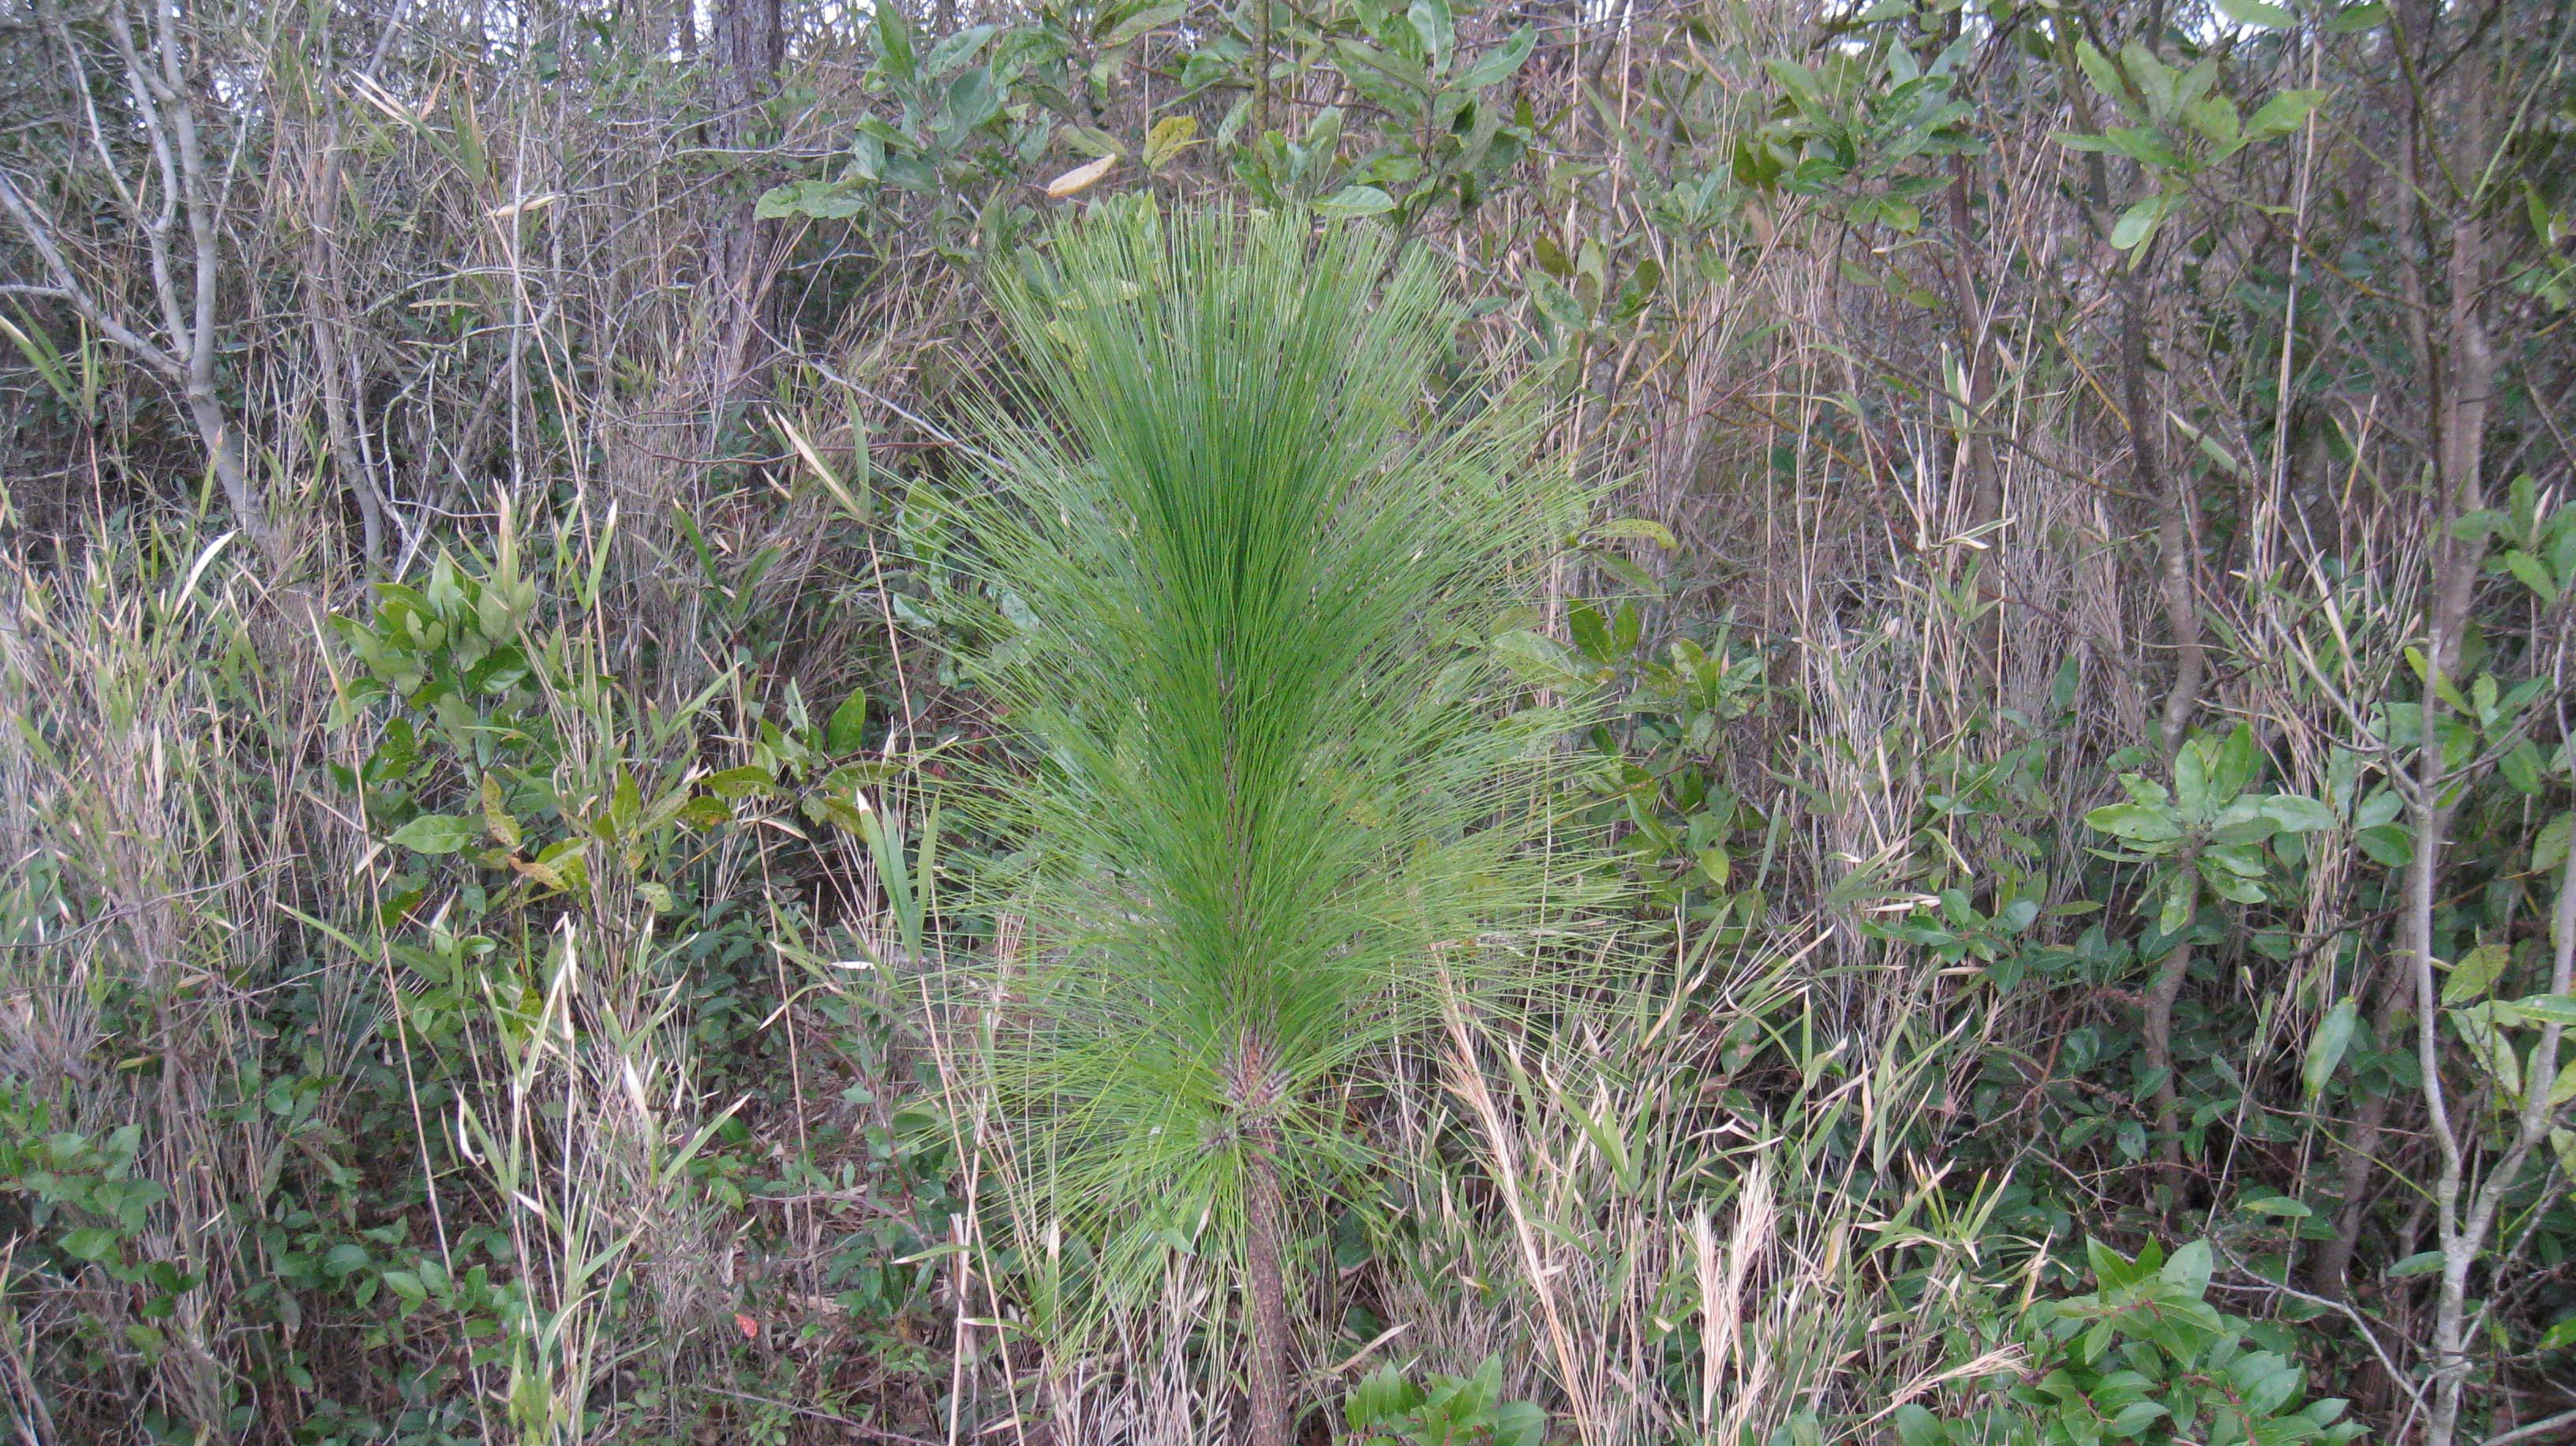 Long leaf pine grows abundantly in Southeastern North Carolina